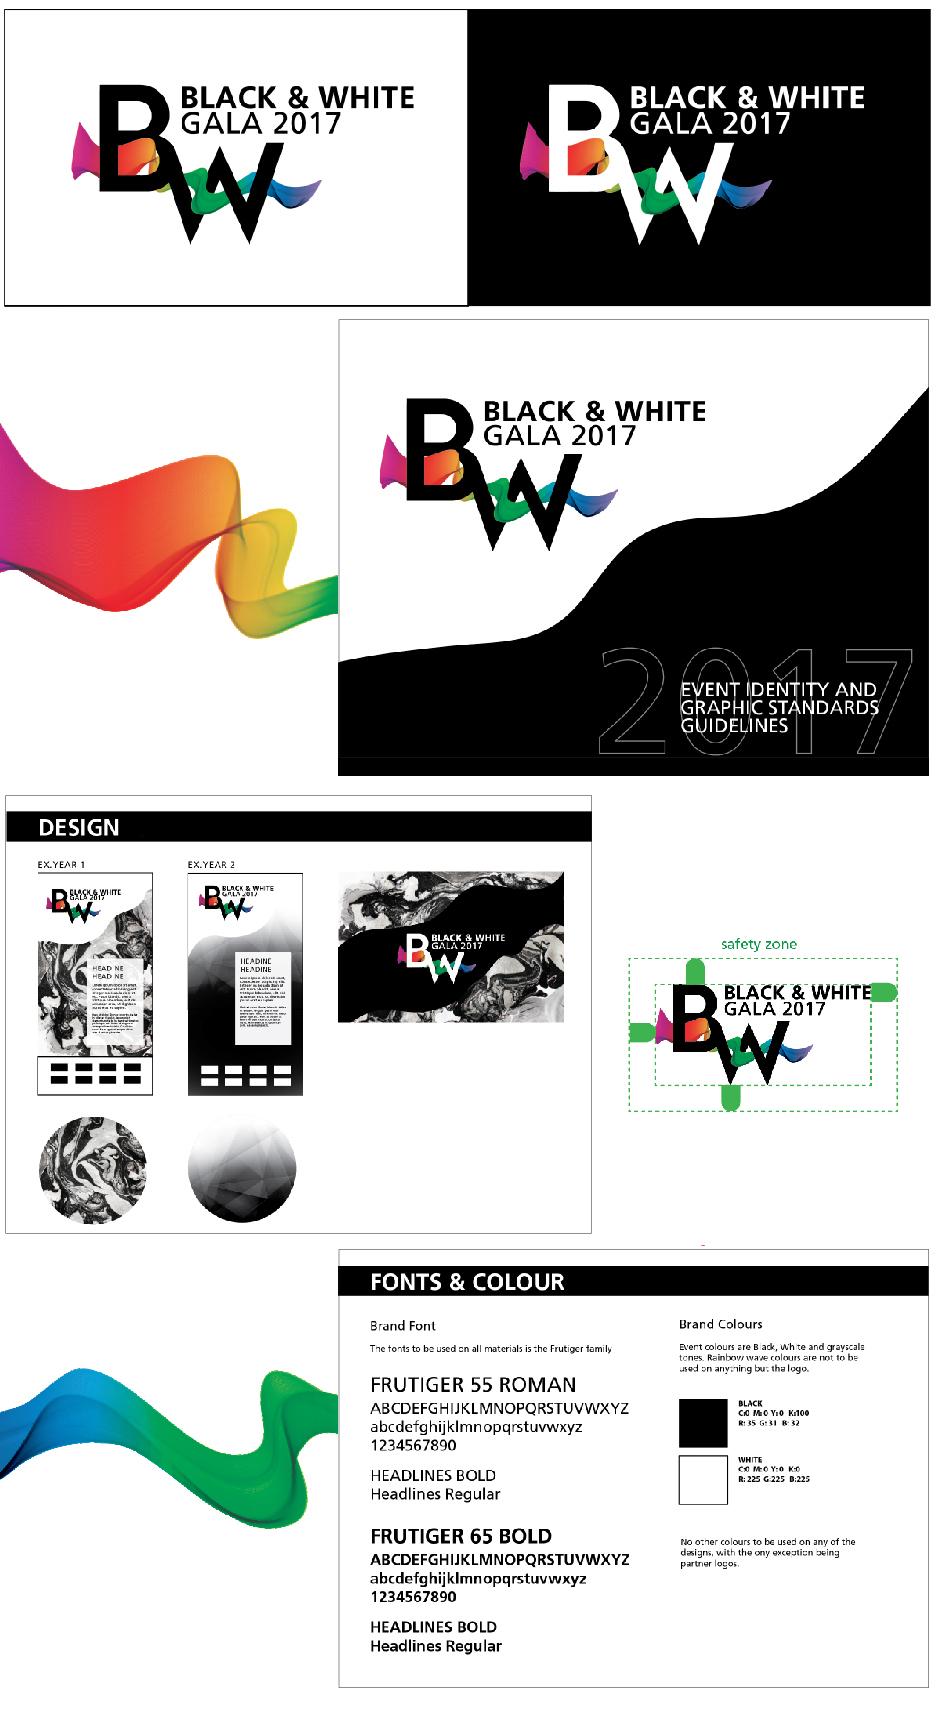 black-white-gala-07